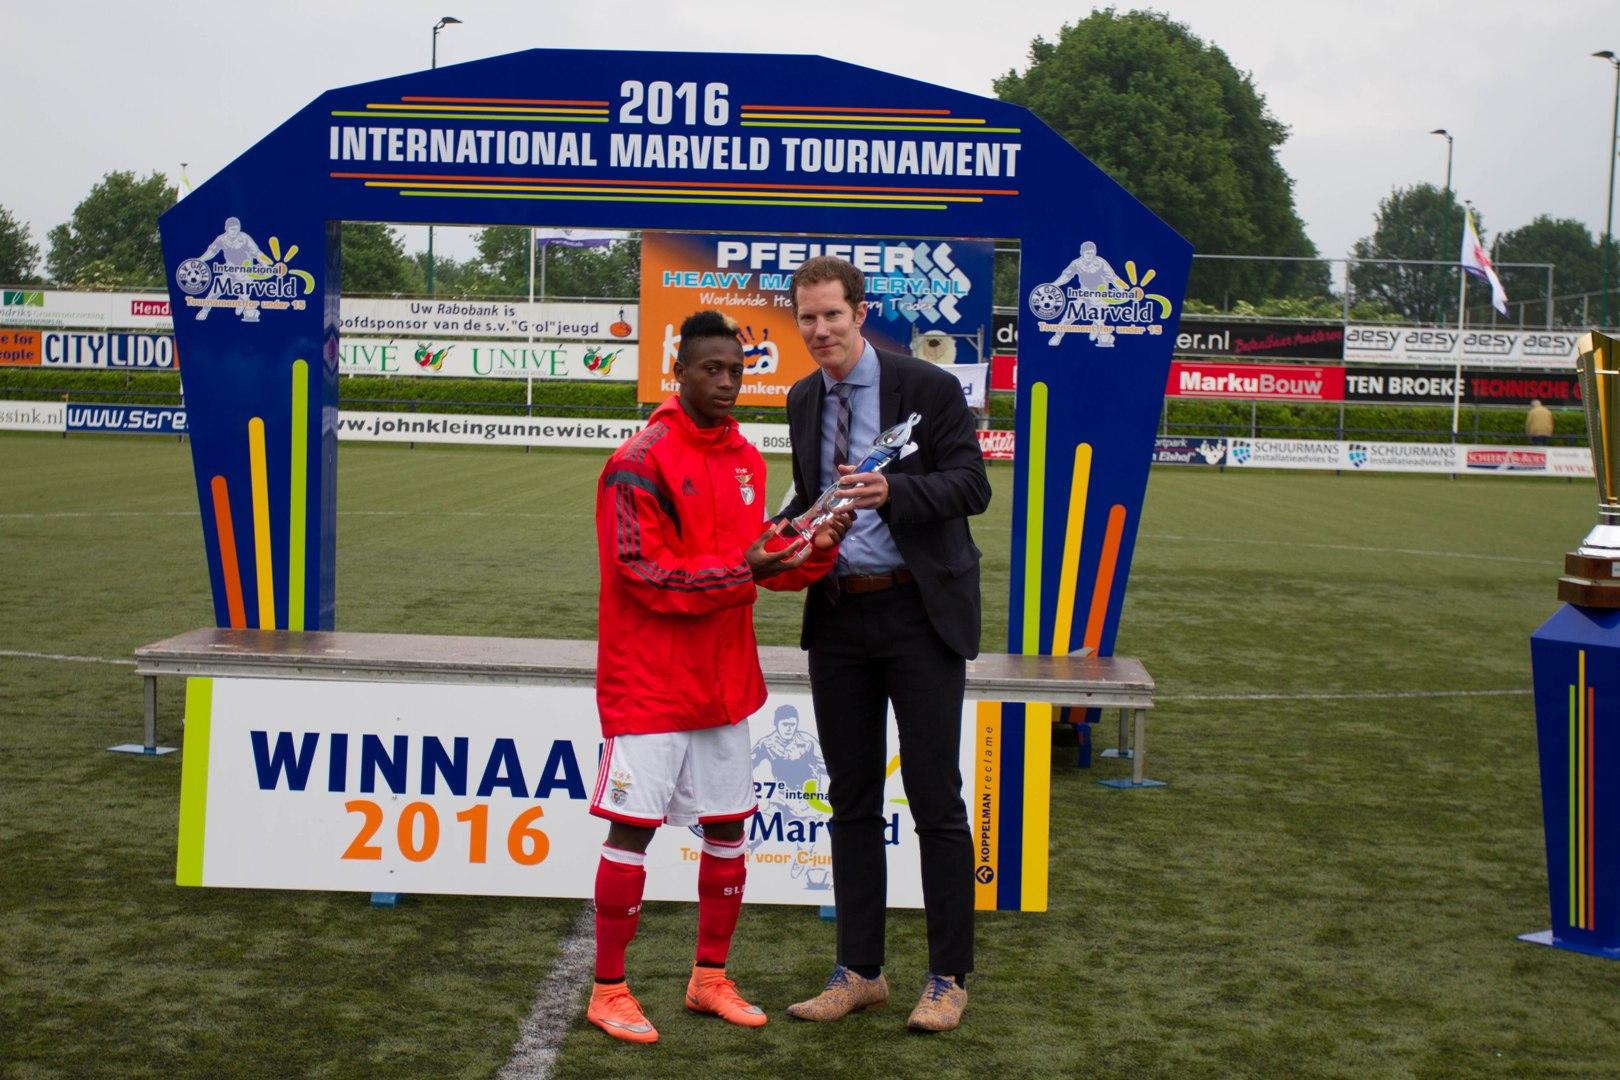 Marveld Tournament 2016 - Fair Play Award SL Benfica